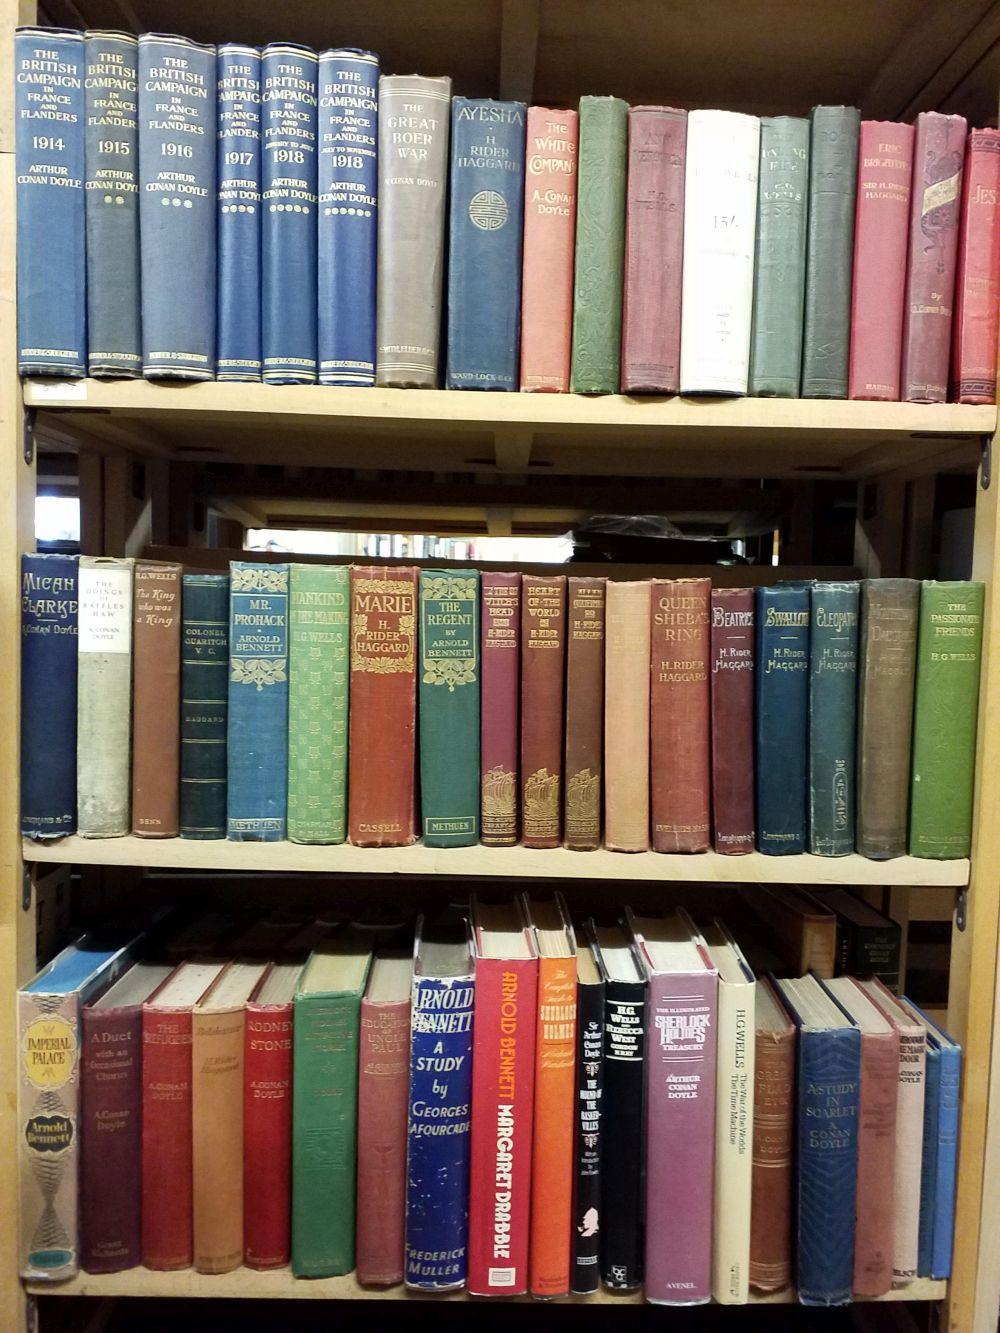 Literature. A collection of Arthur Conan Doyle & early 20th-century literature